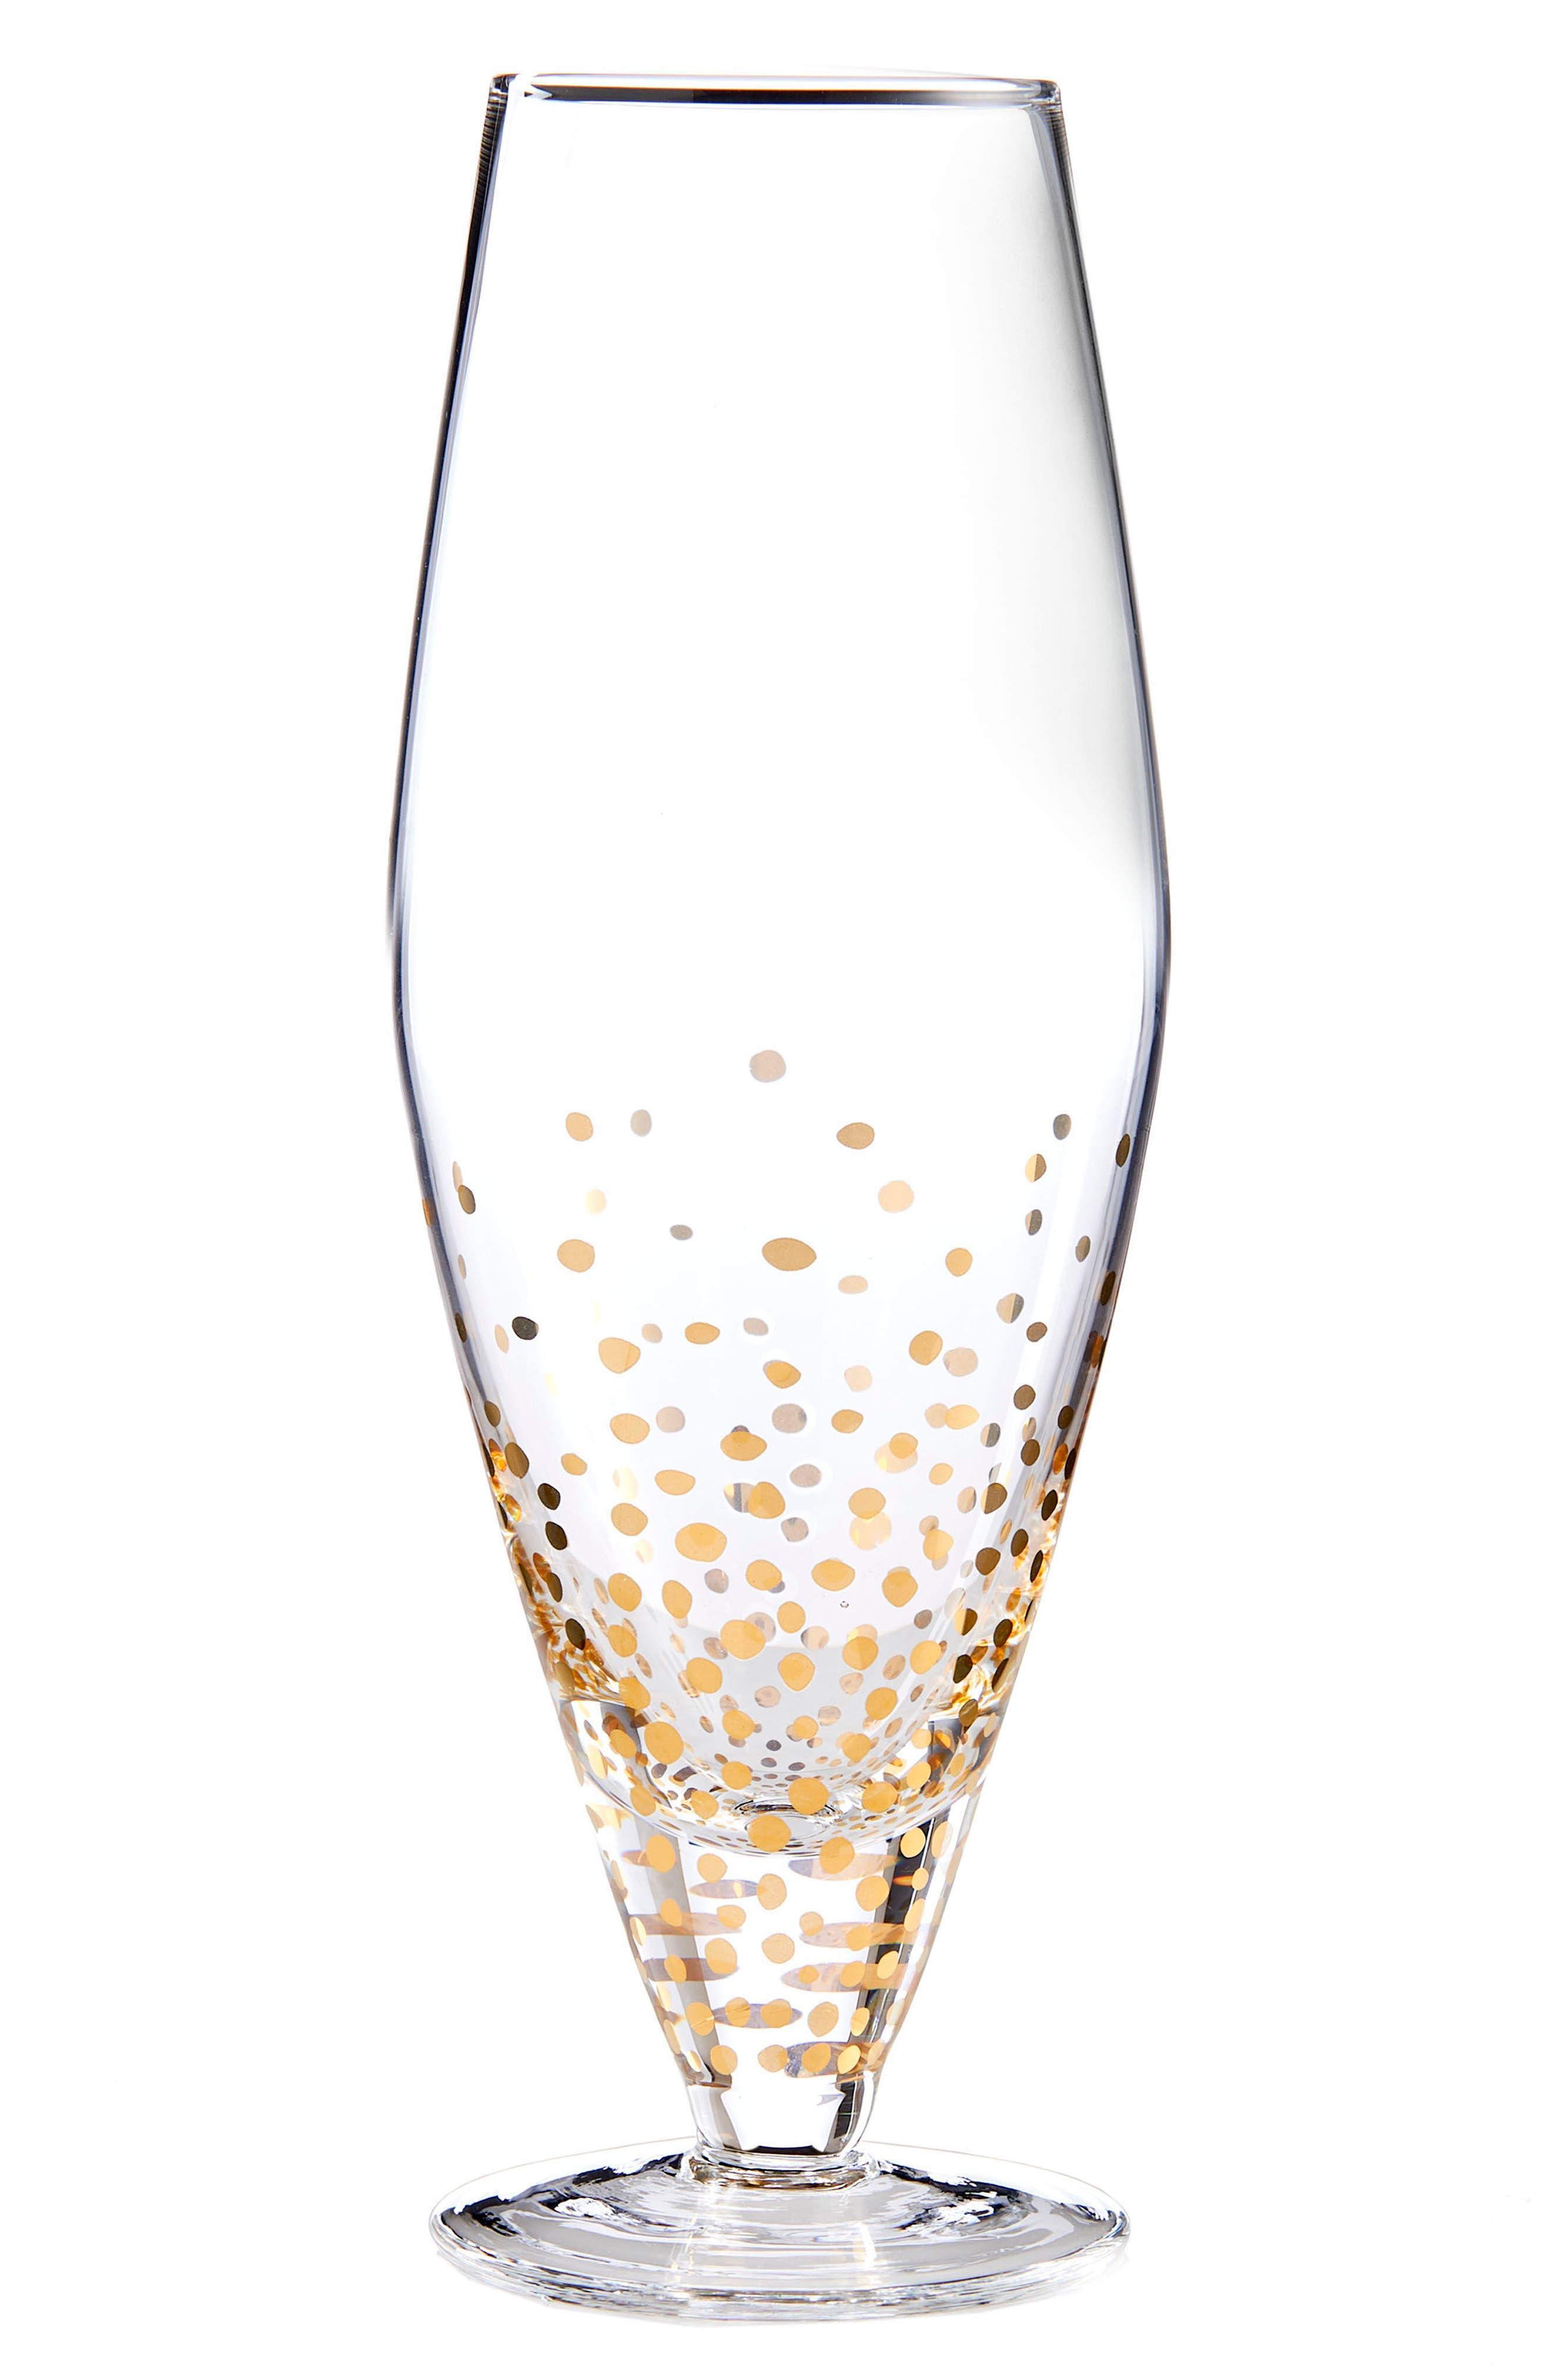 American Atelier Gold Luster Set of 4 Wine Glasses